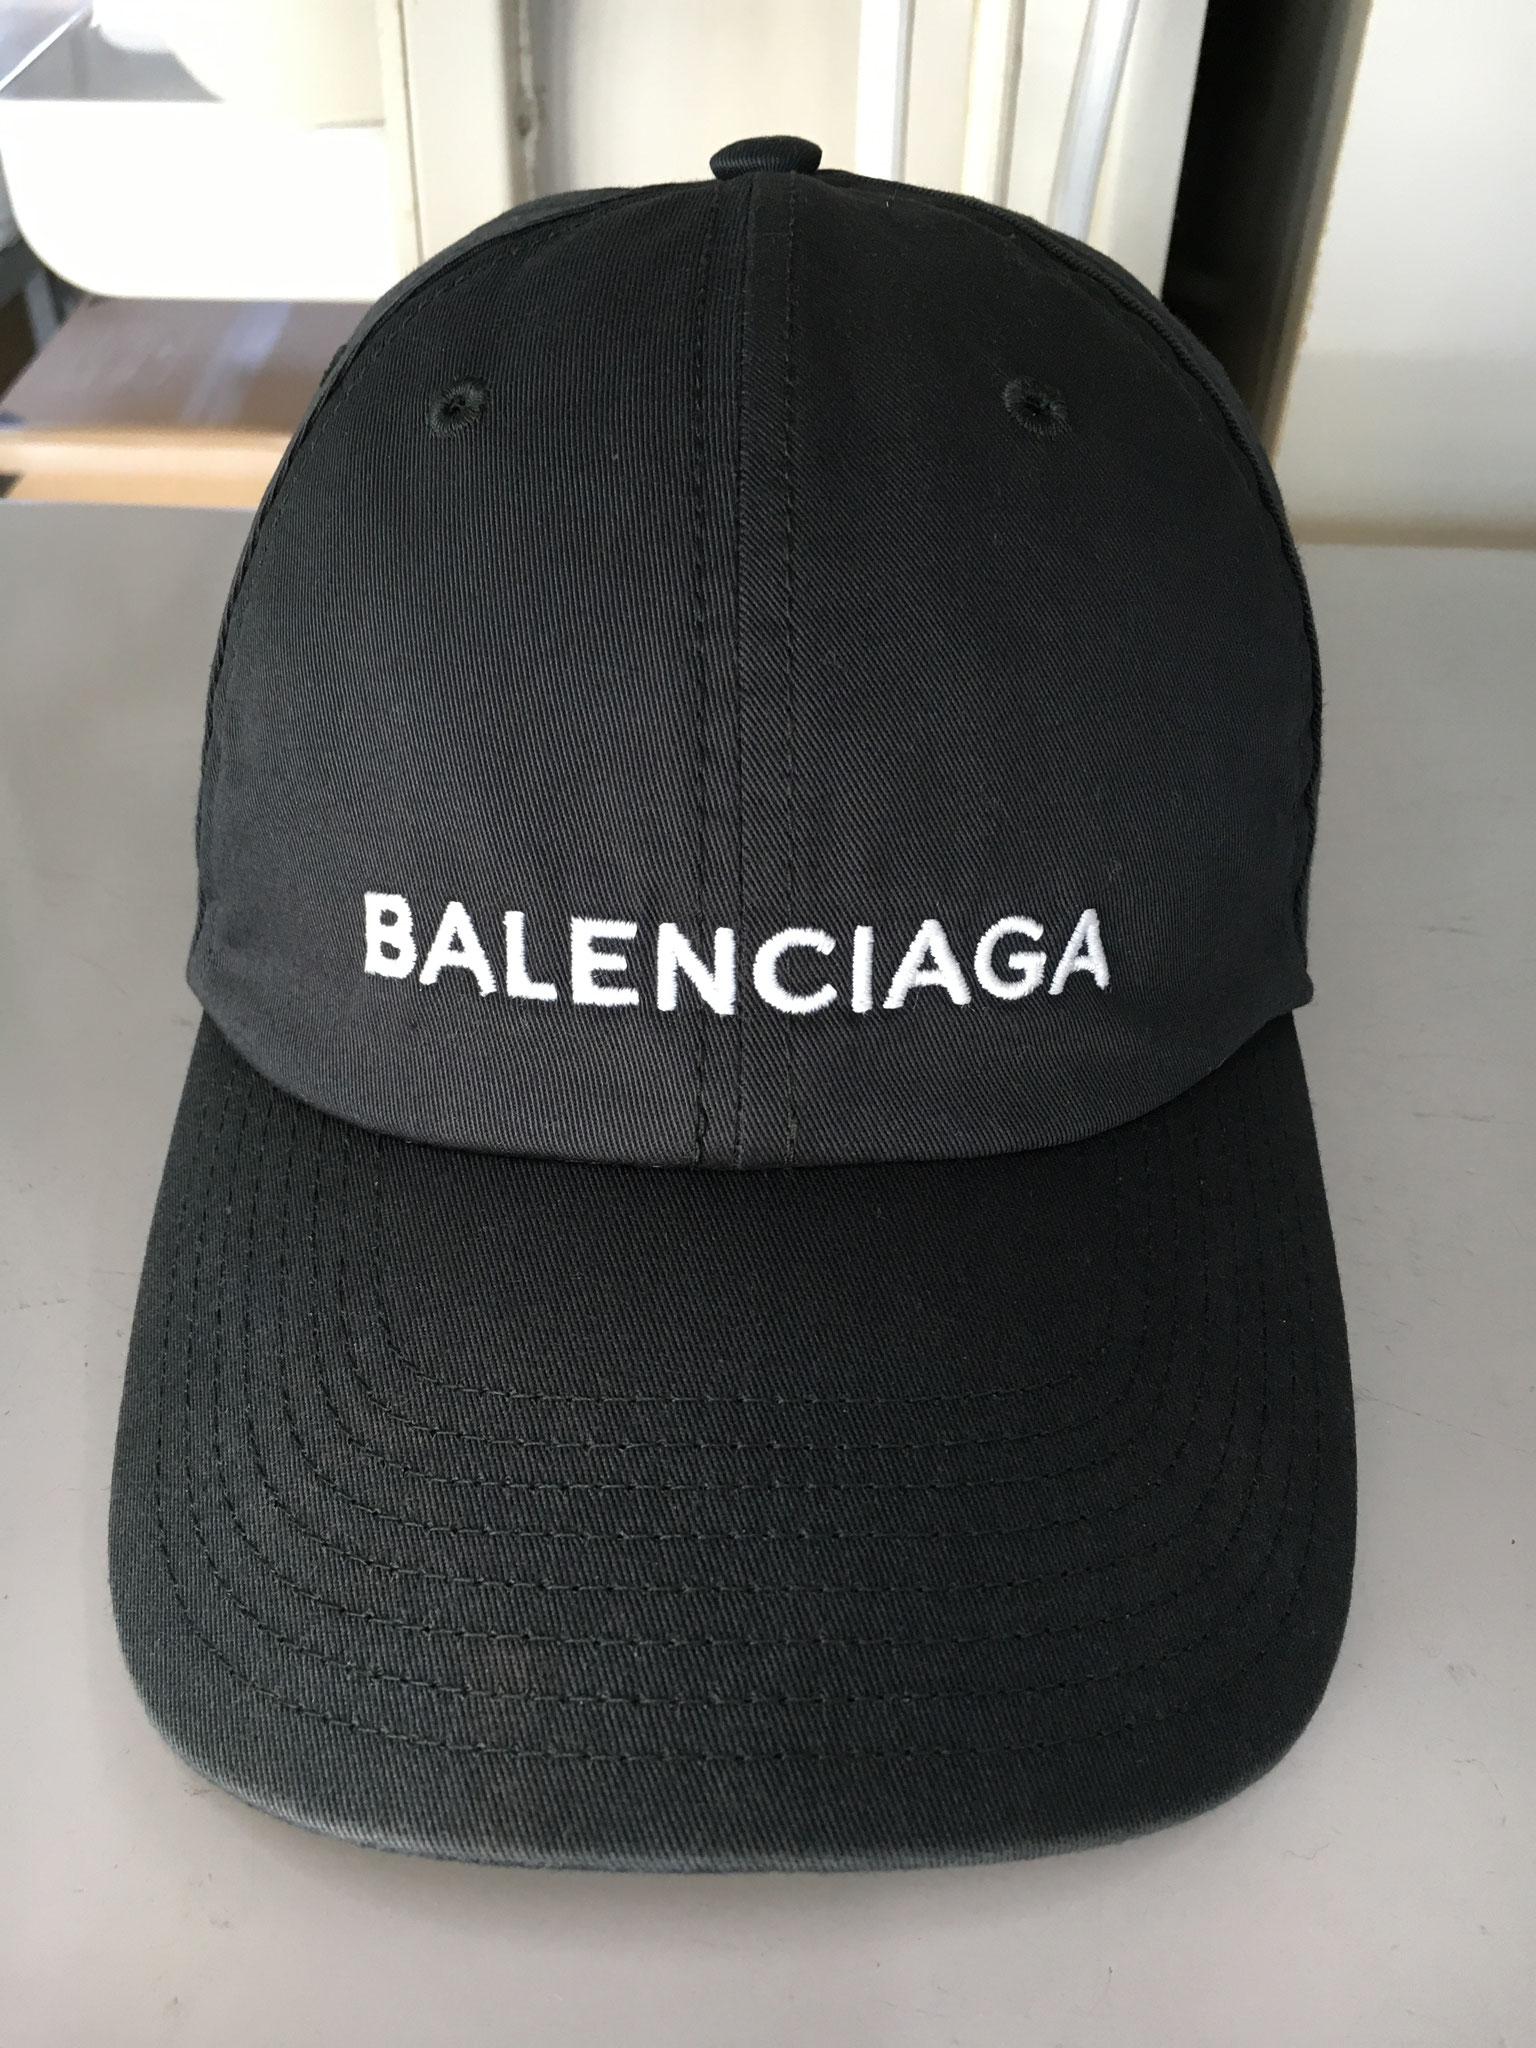 BALENCIAGAキャップのクリーニング